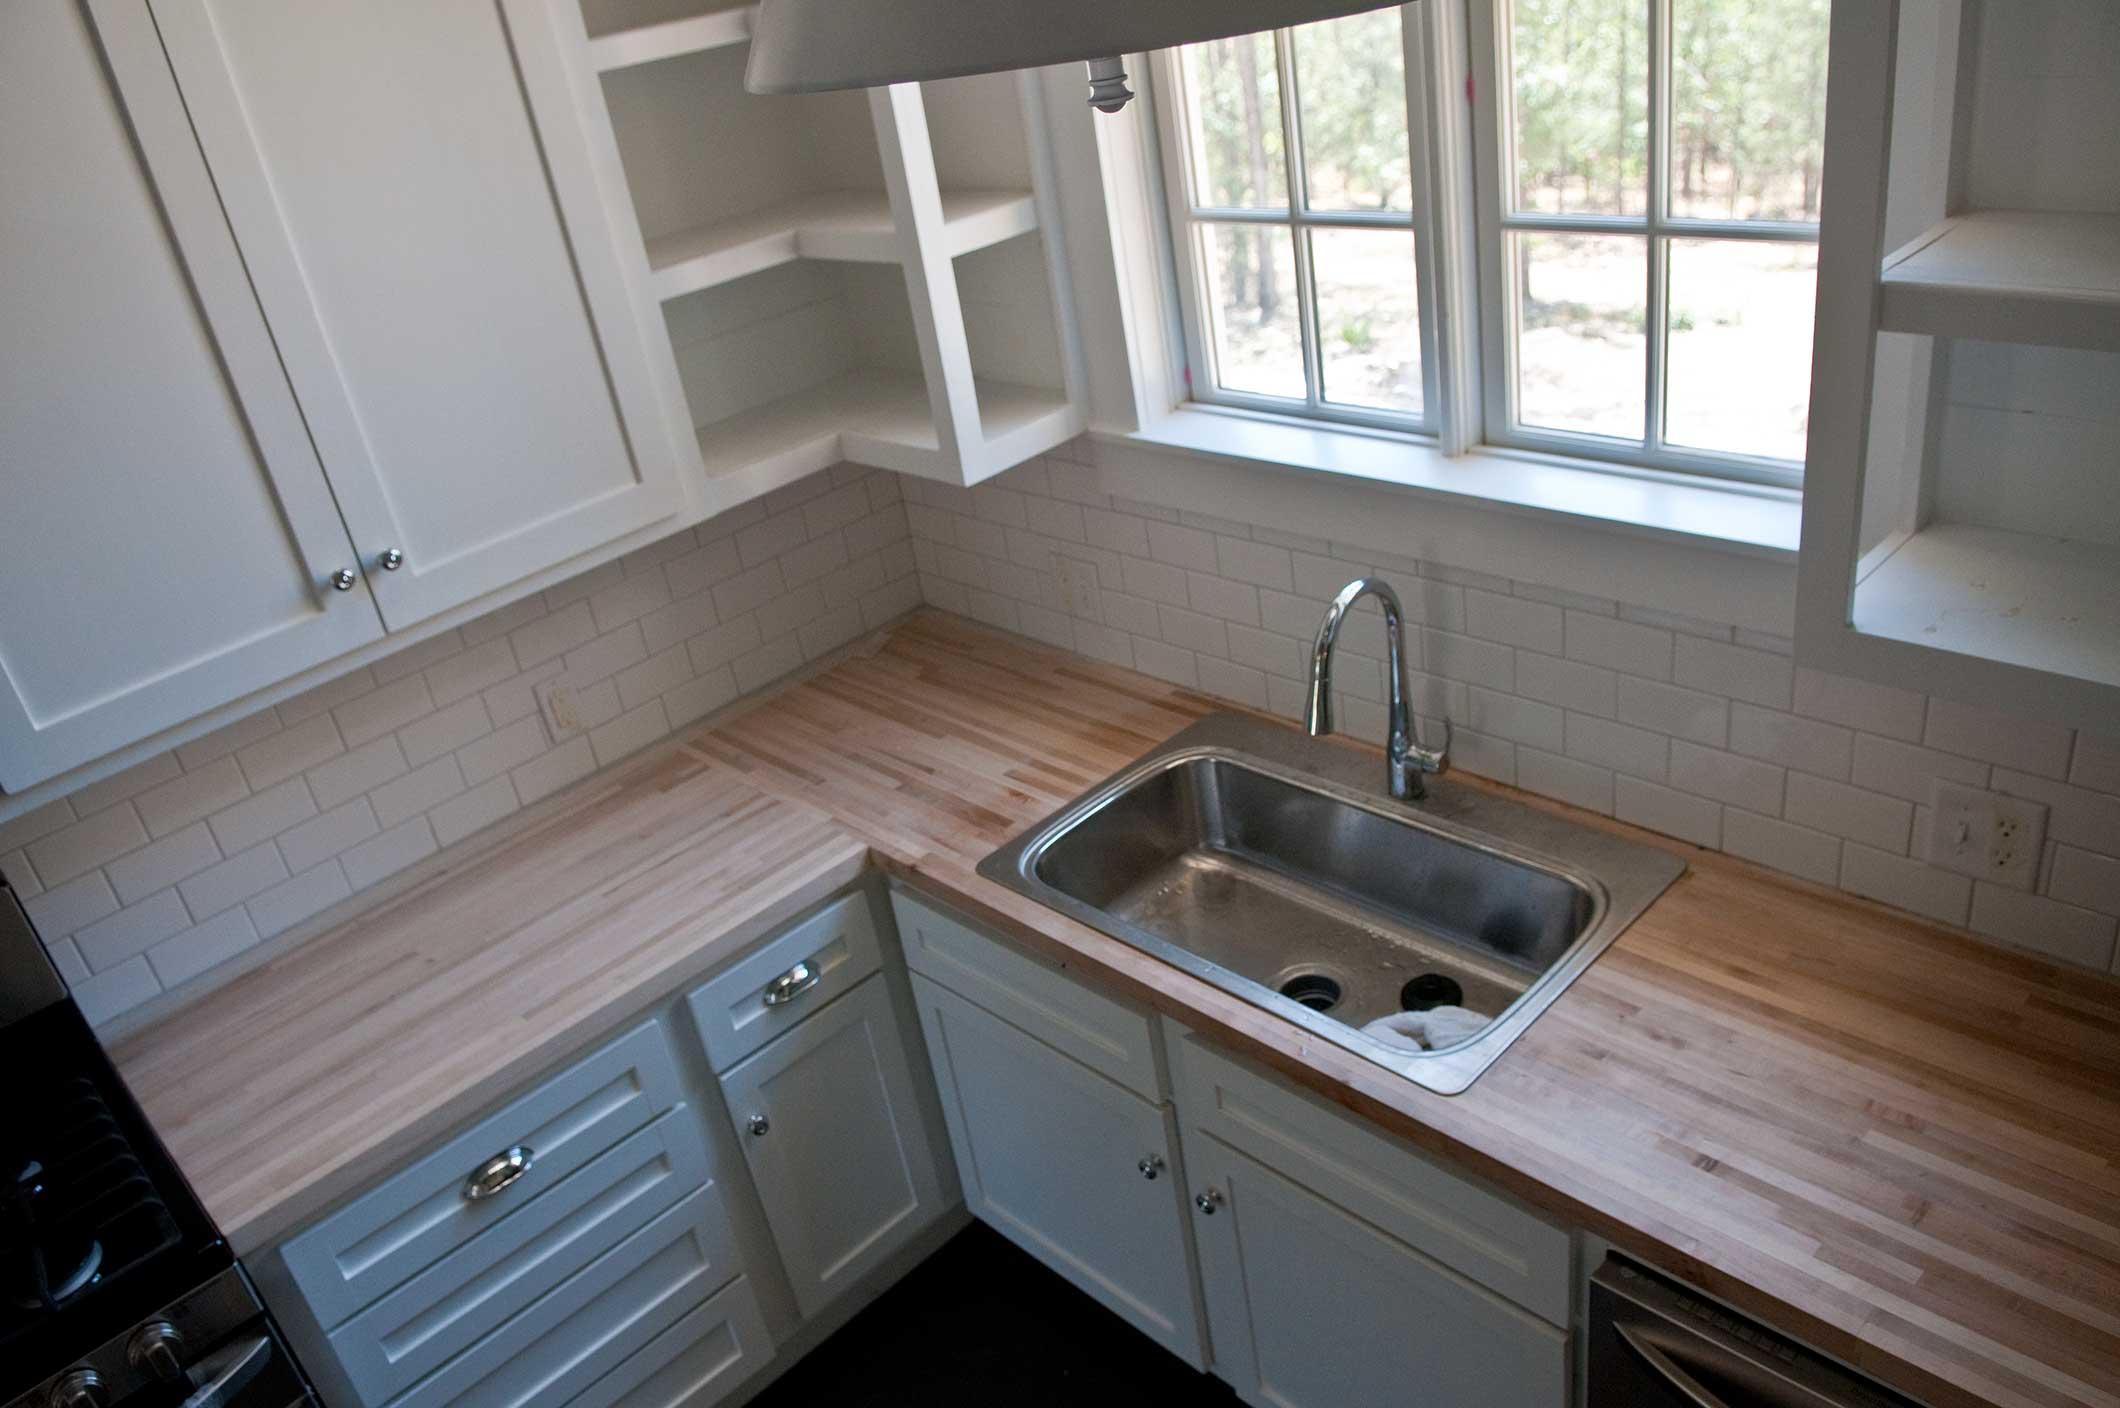 cherry wood kitchen table revive cabinets butcher block countertops – p. allen smith